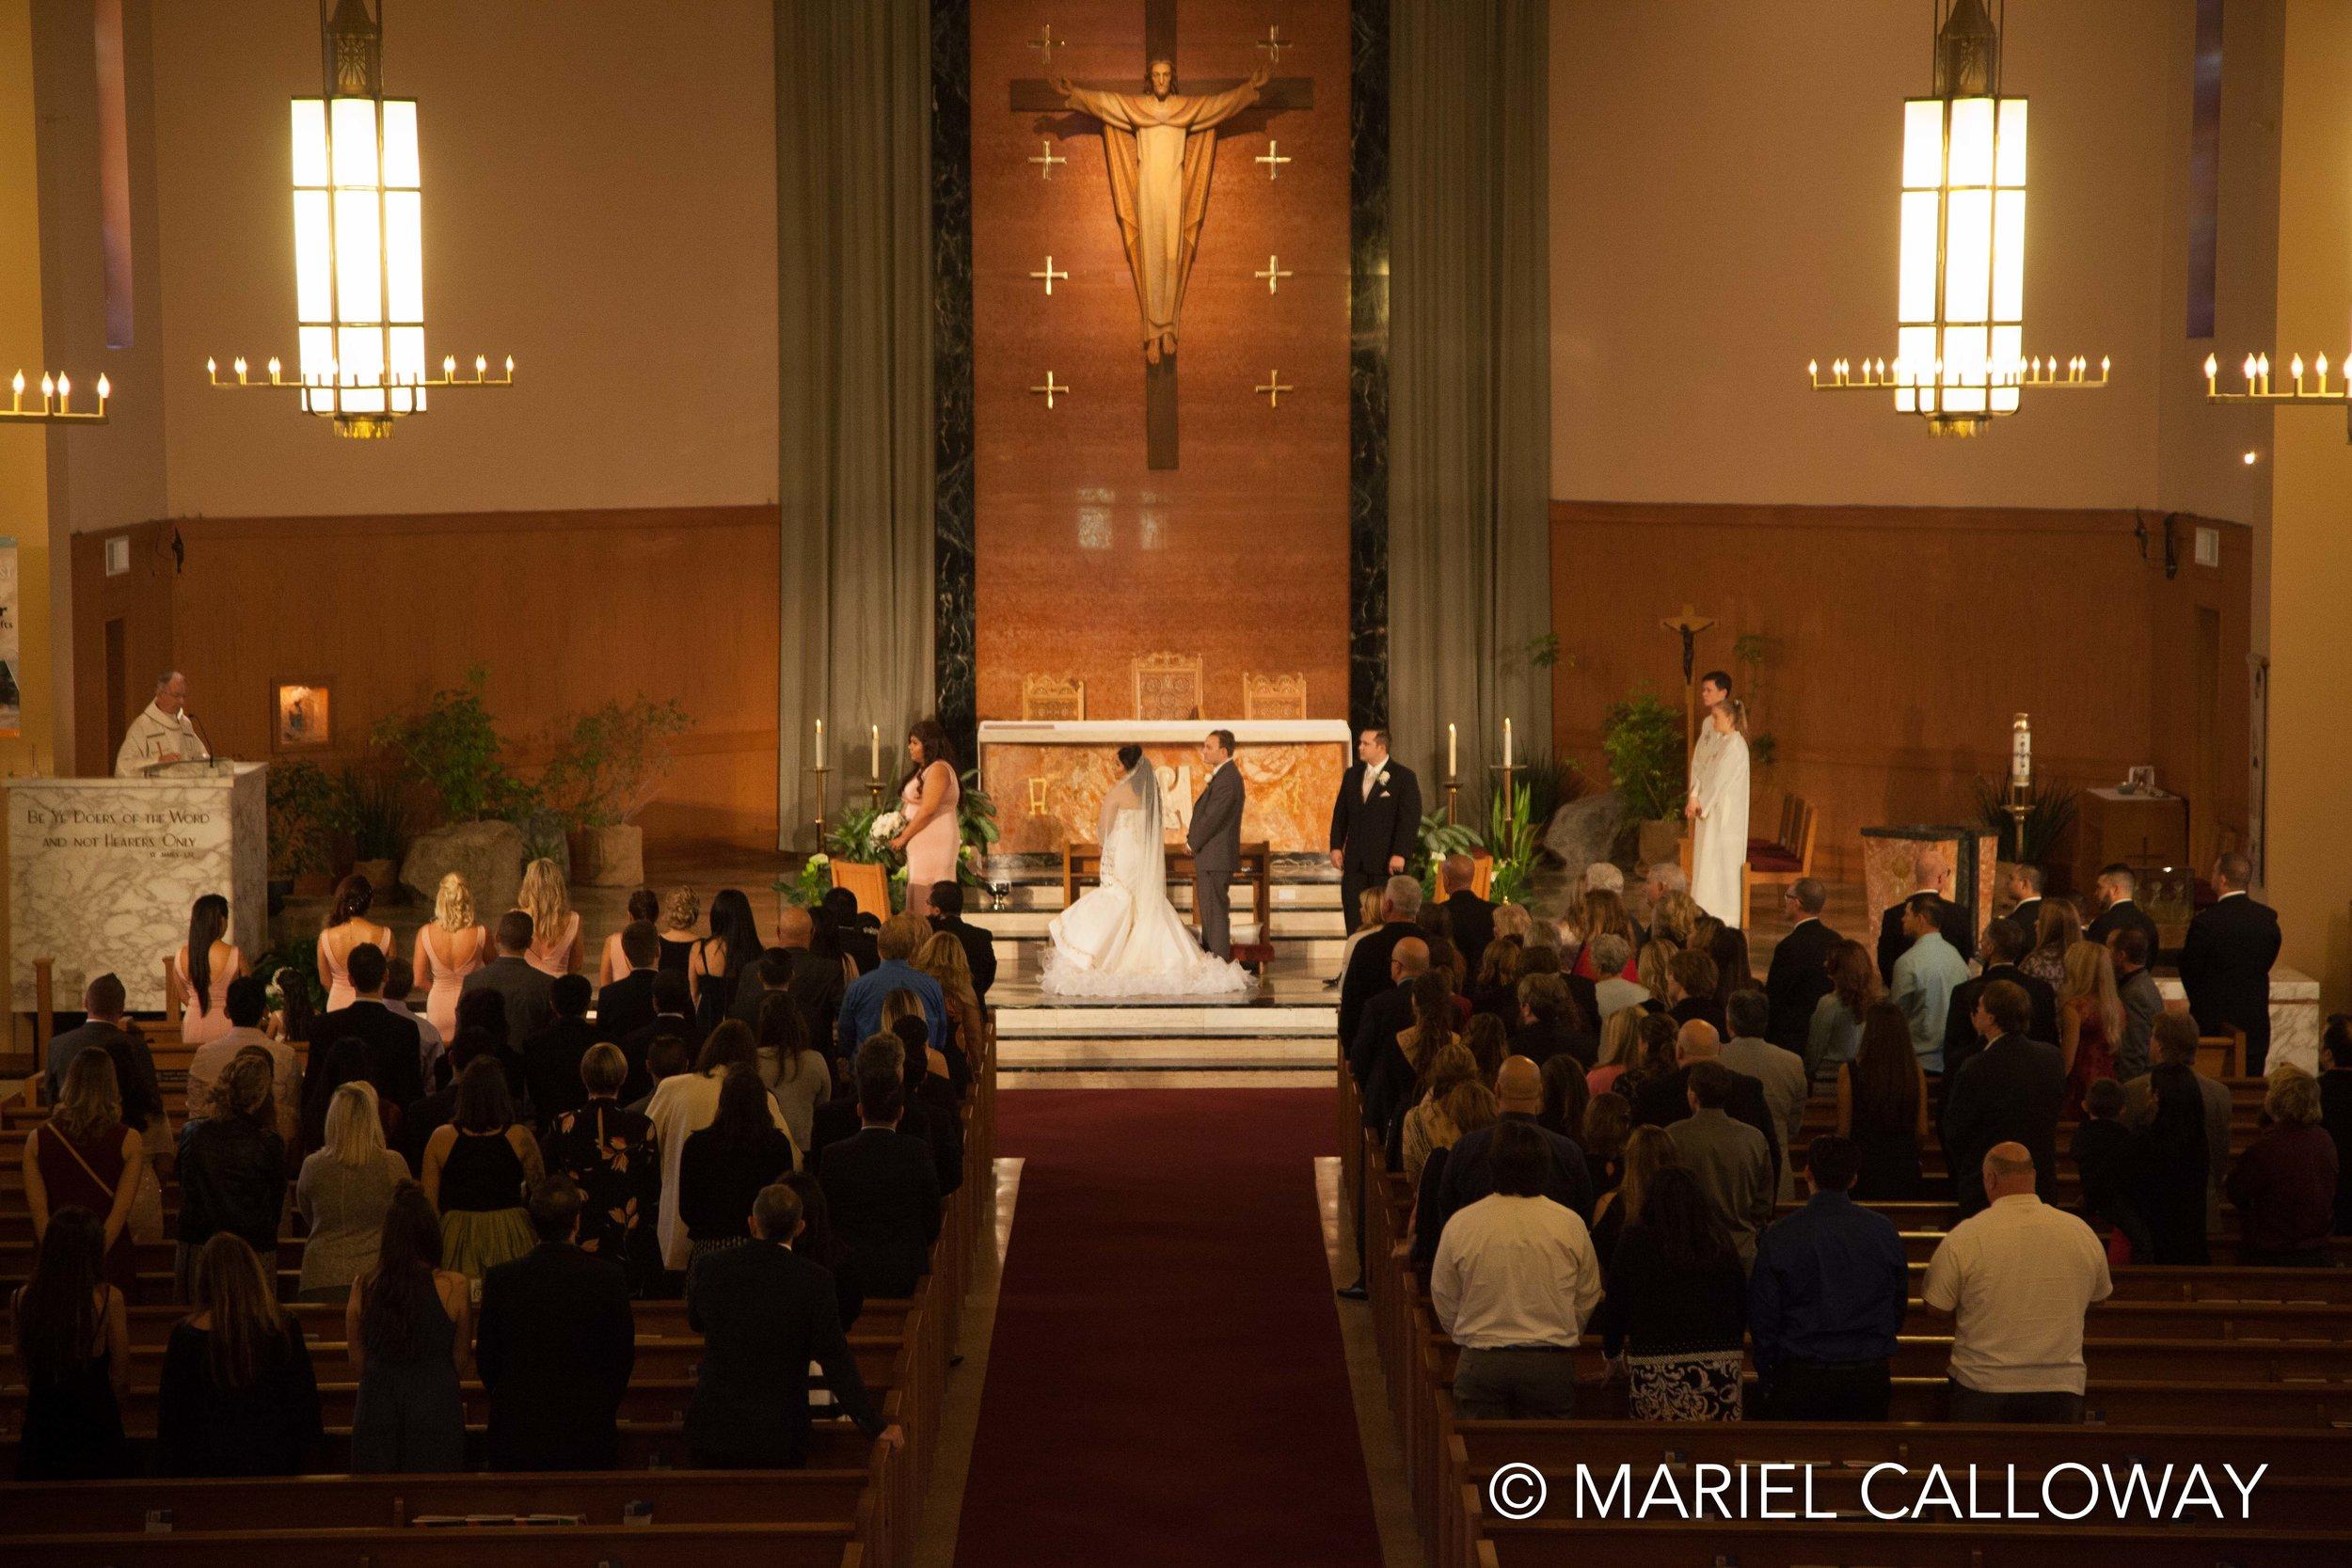 Mariel-Calloway-Los-Angeles-Wedding-Photography-Rossi-45.jpg